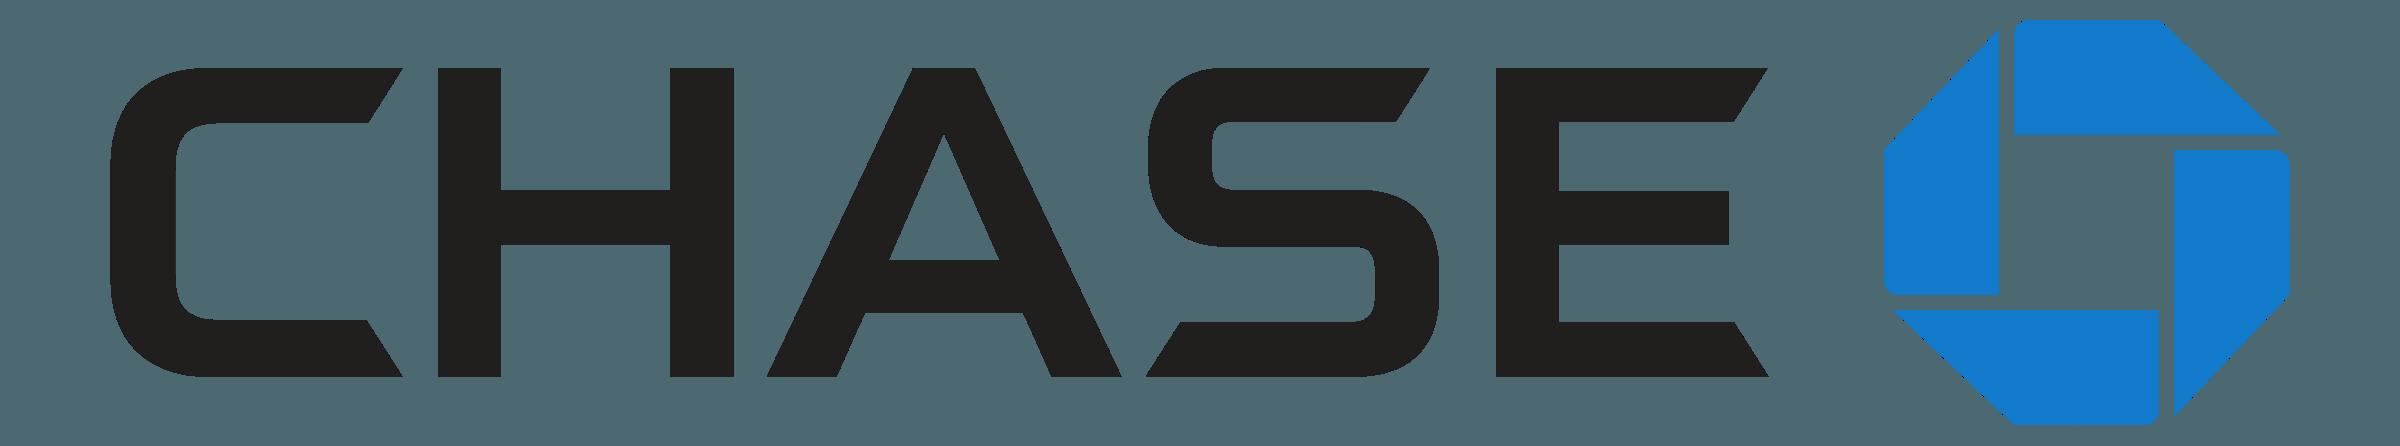 chase-logo-transparent.png